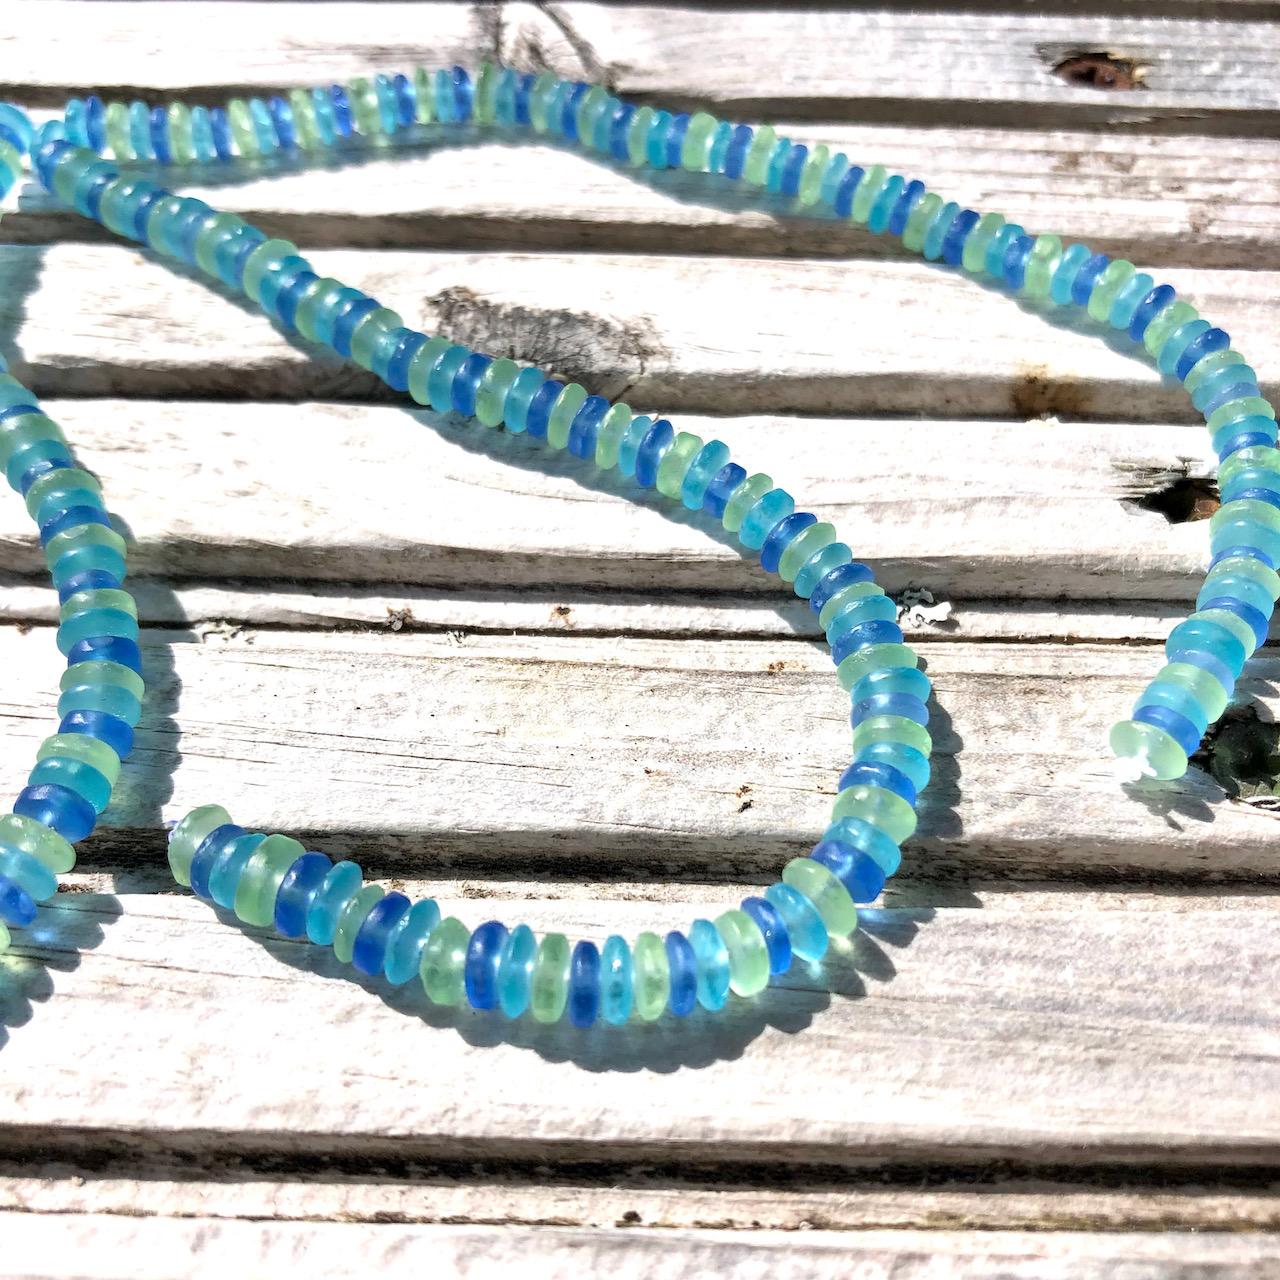 Tiny Round Spacer Beads